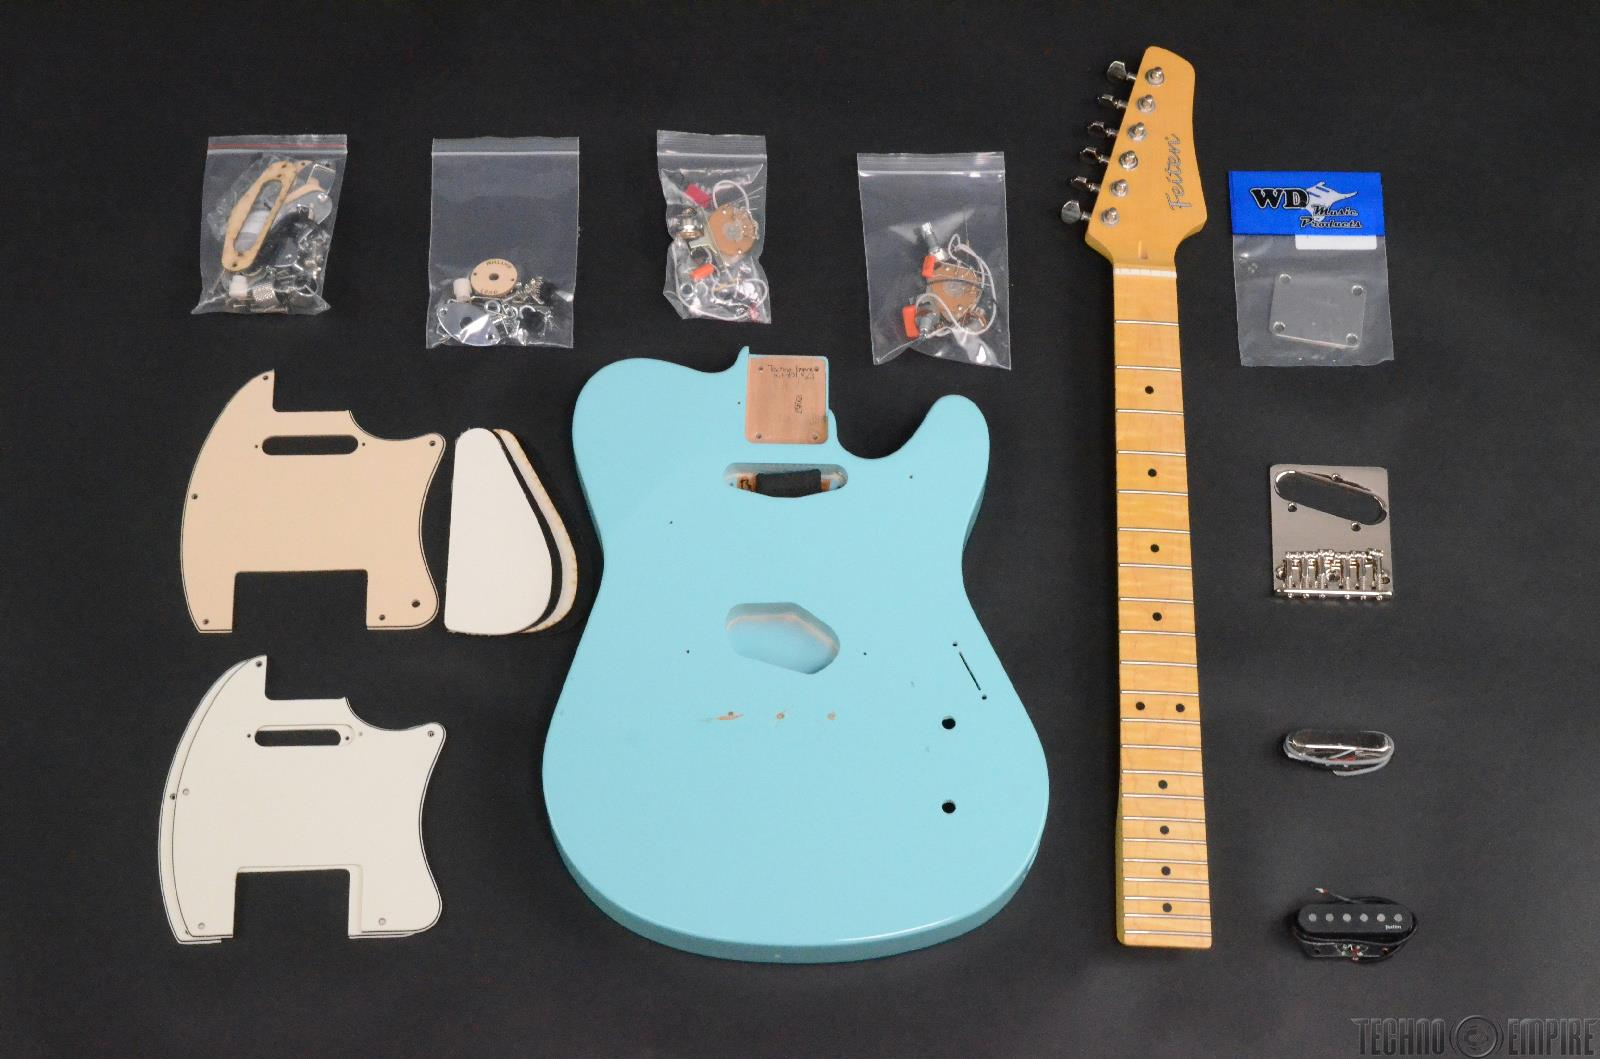 Buzz Feiten T-Pro Build Your Own Electric Guitar Kit #28527